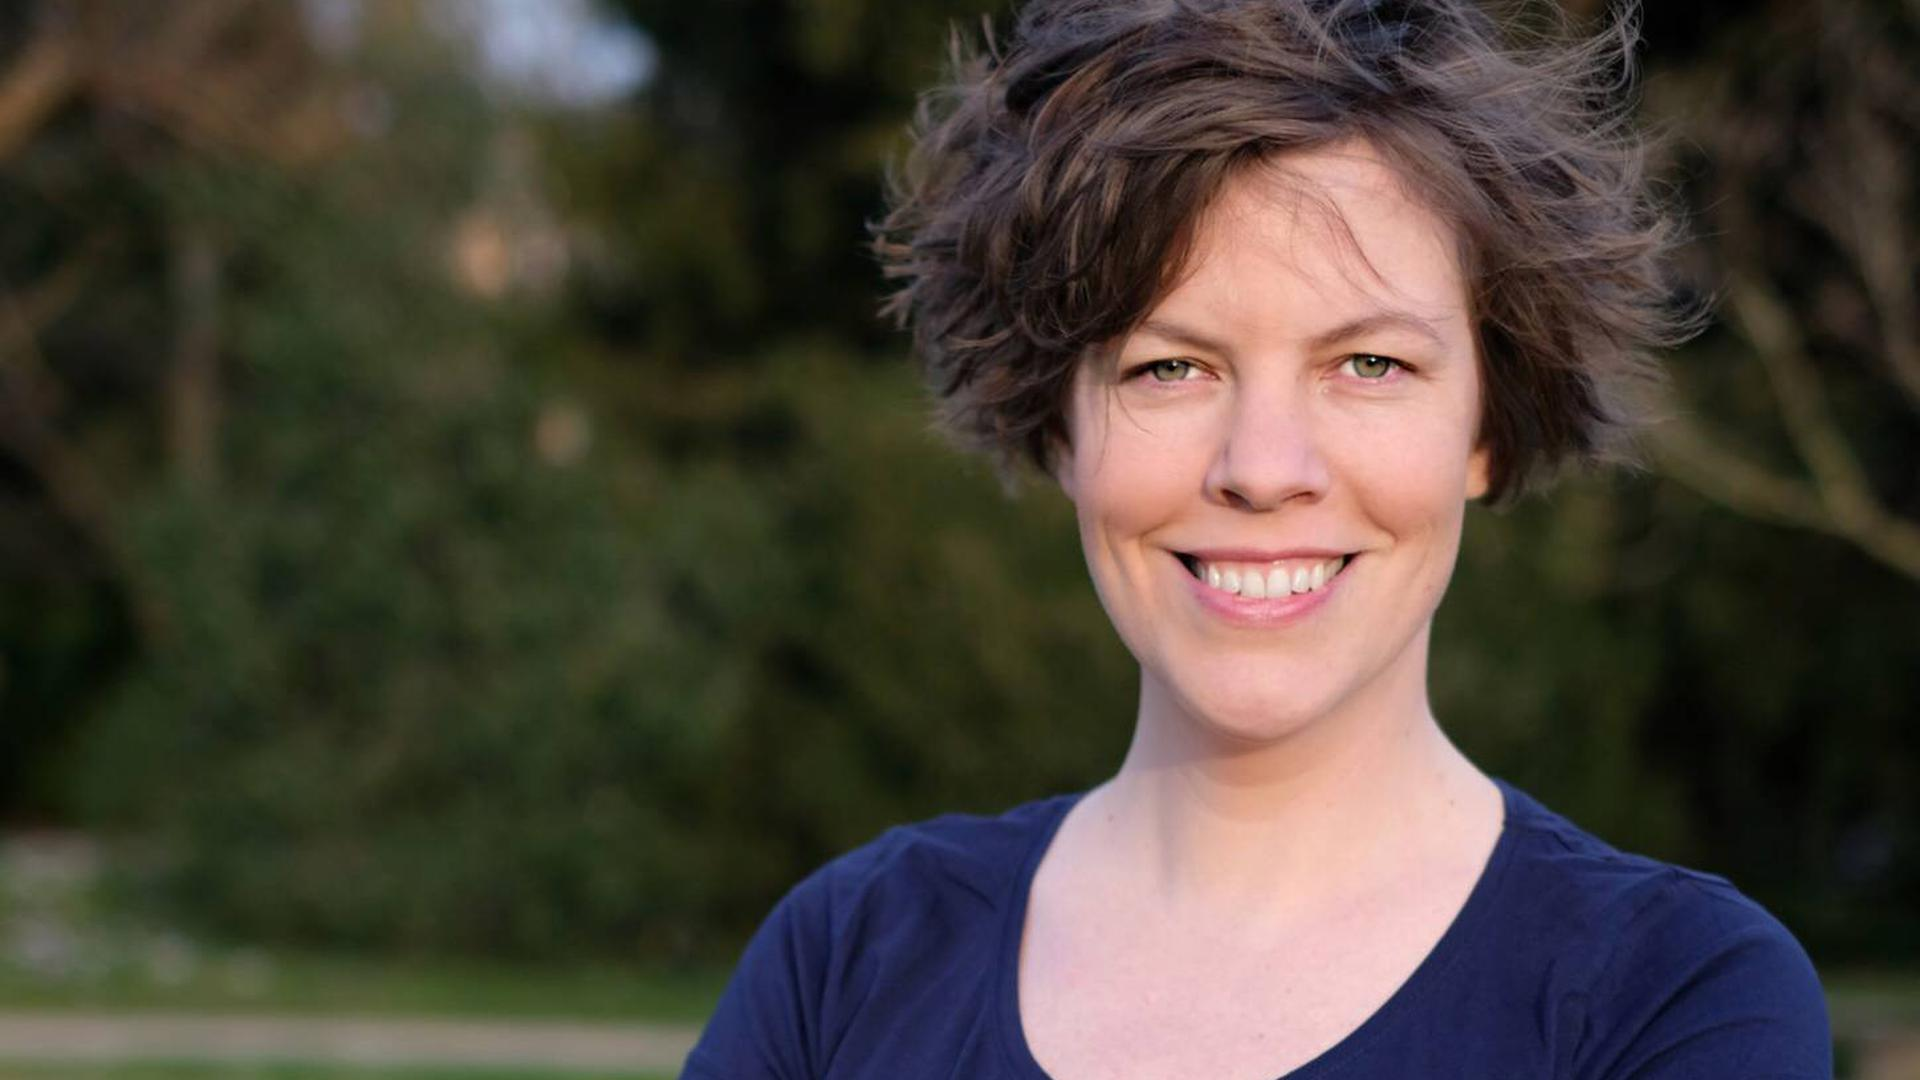 Jorinda Fahringer Grüne Gemeinderat Kommunalwahl 2019 Karlsruhe